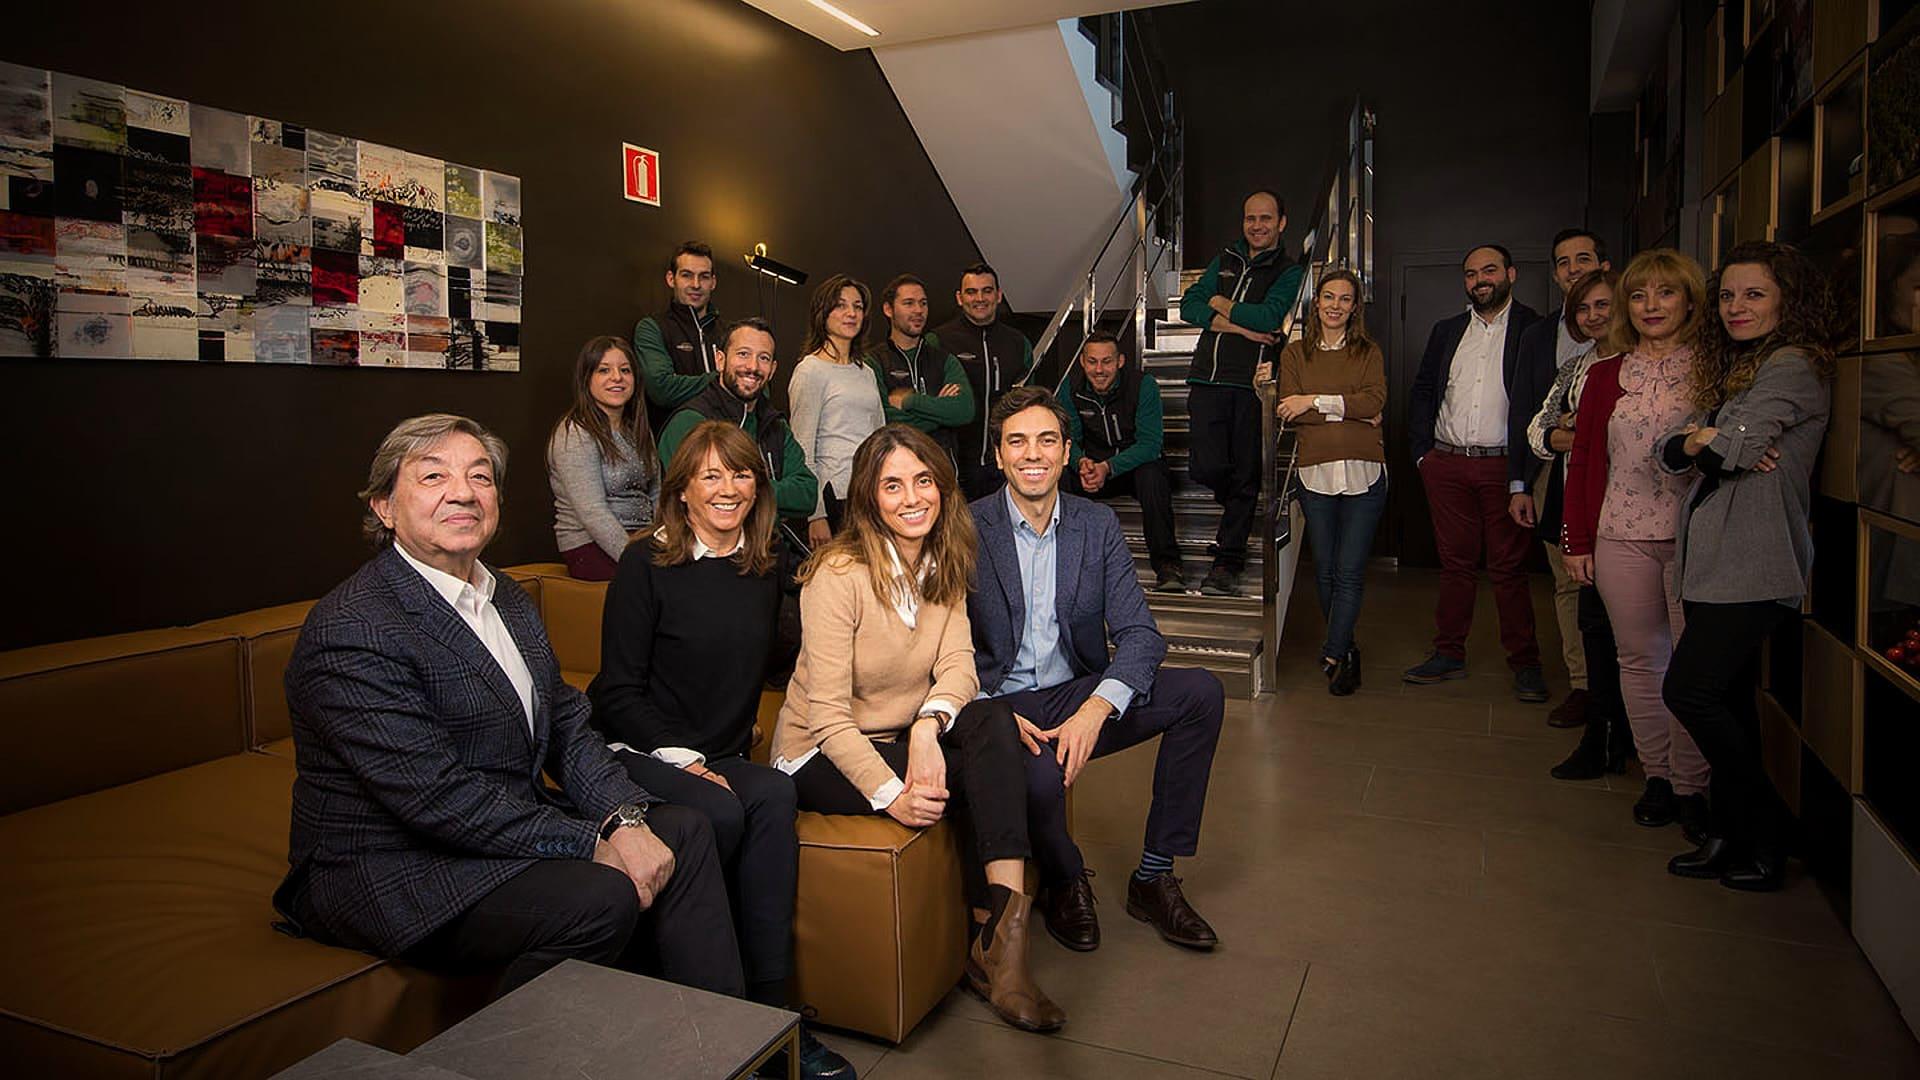 Equipo Bodegas Jose Pariente foto de familia